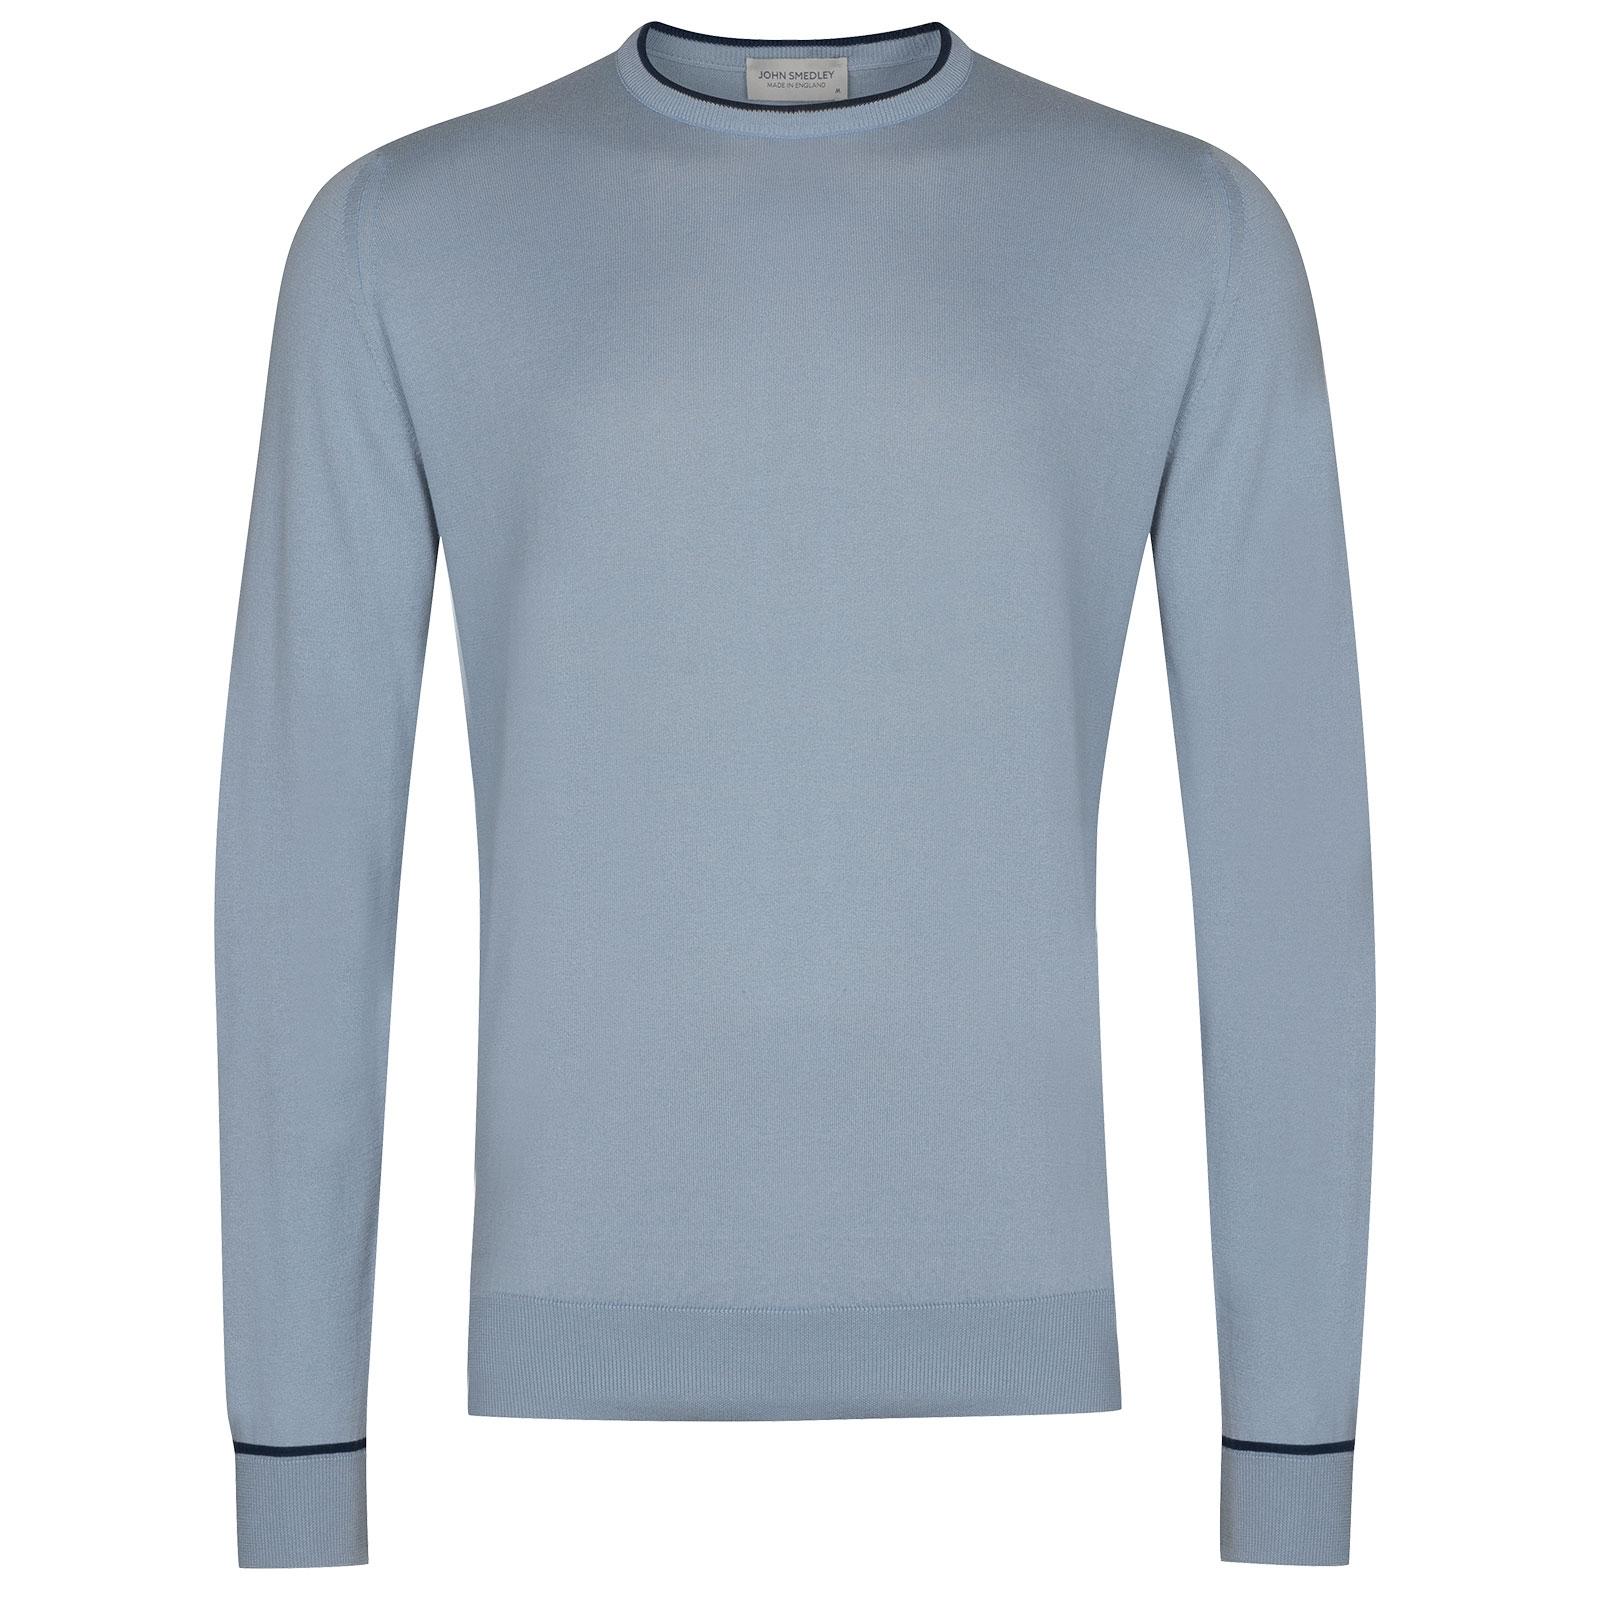 John Smedley Astin in Dusk Blue Pullover-XLG